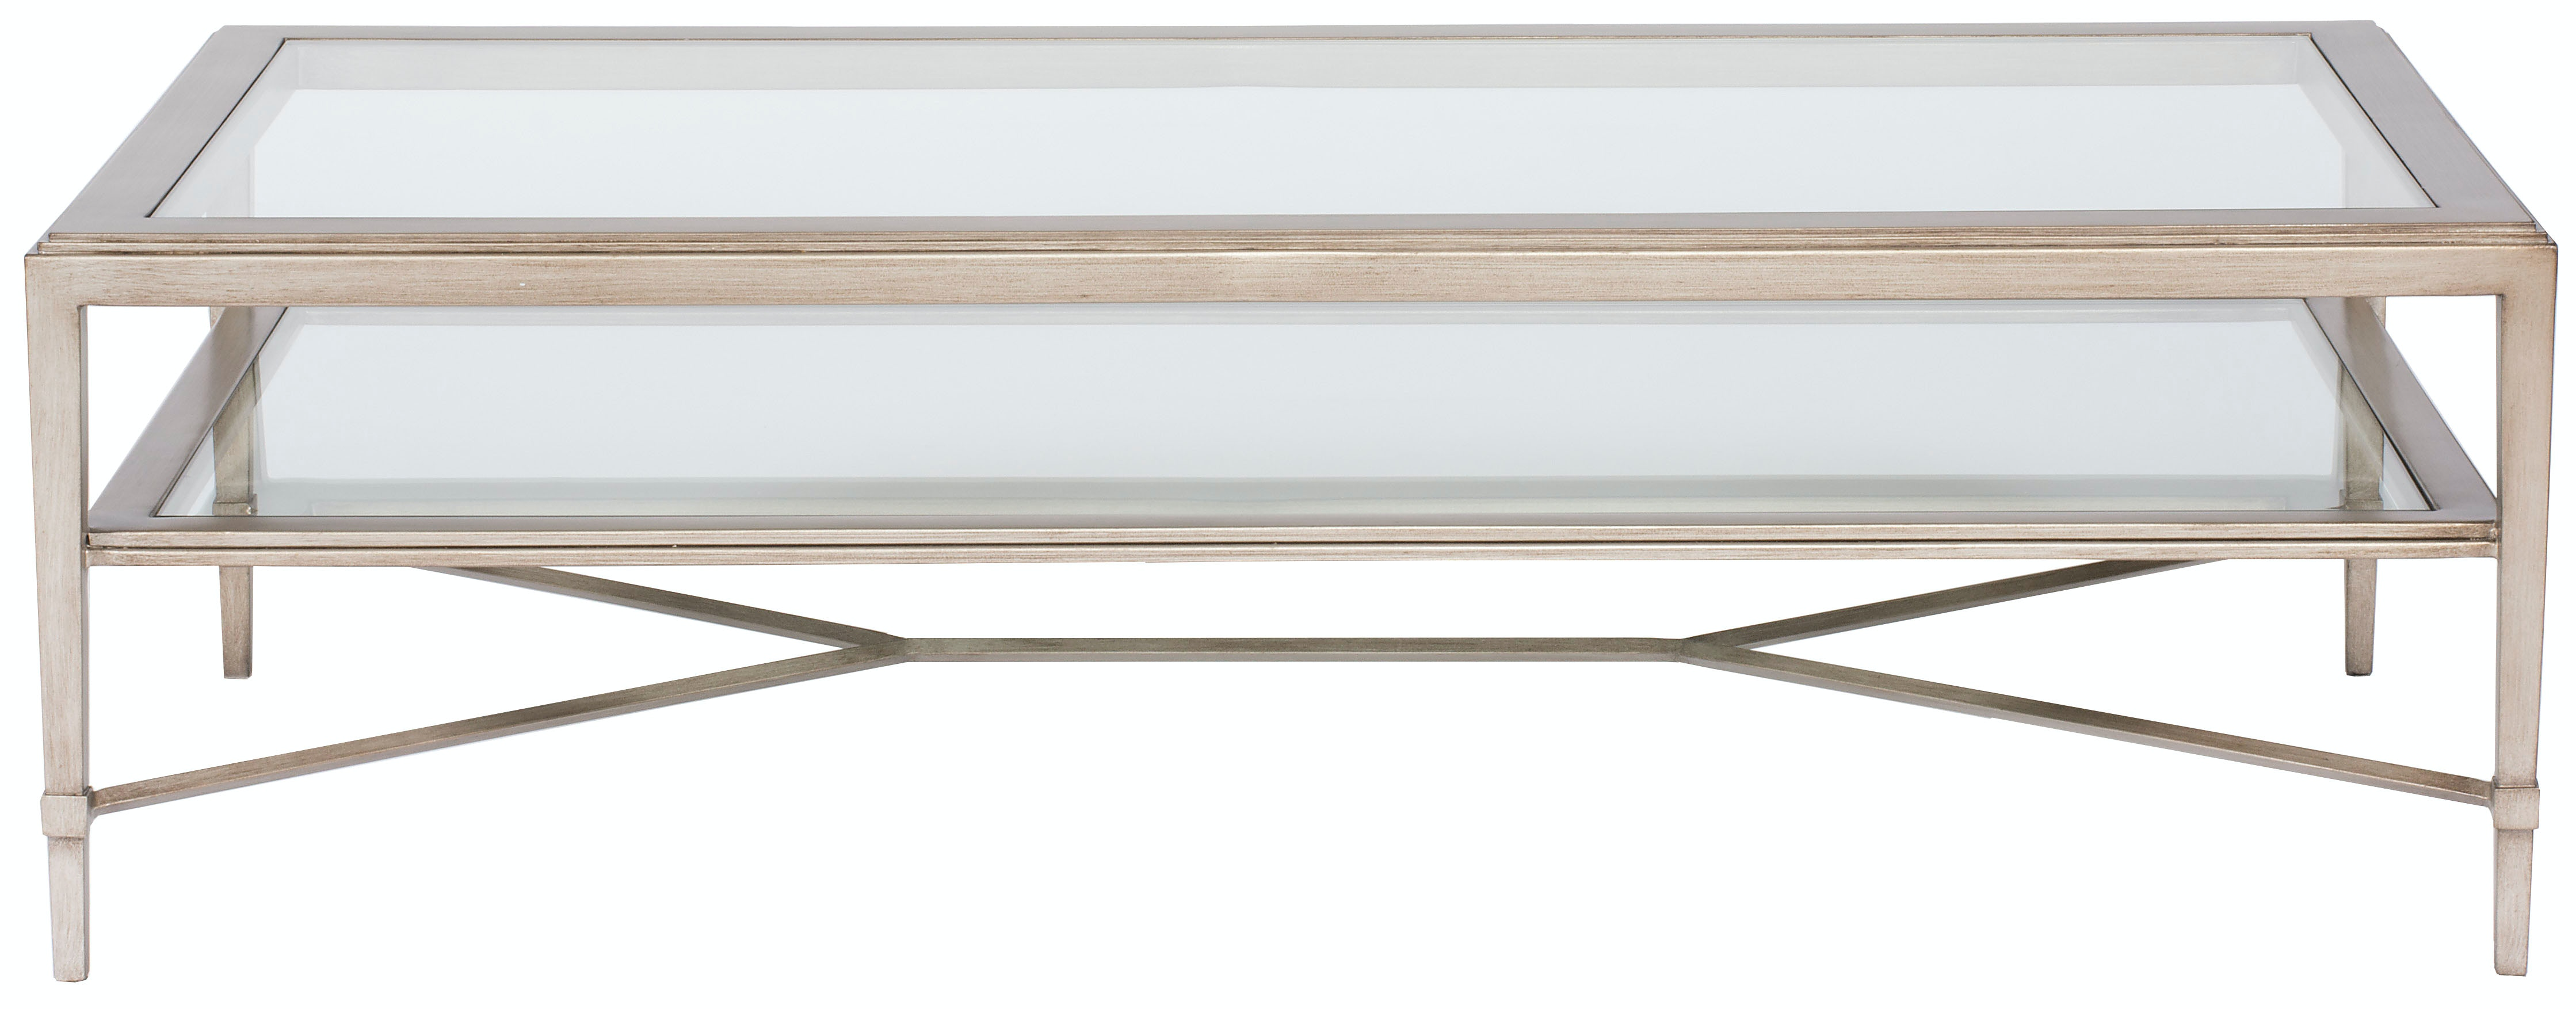 Vanguard Sloan Cocktail Table W284CR